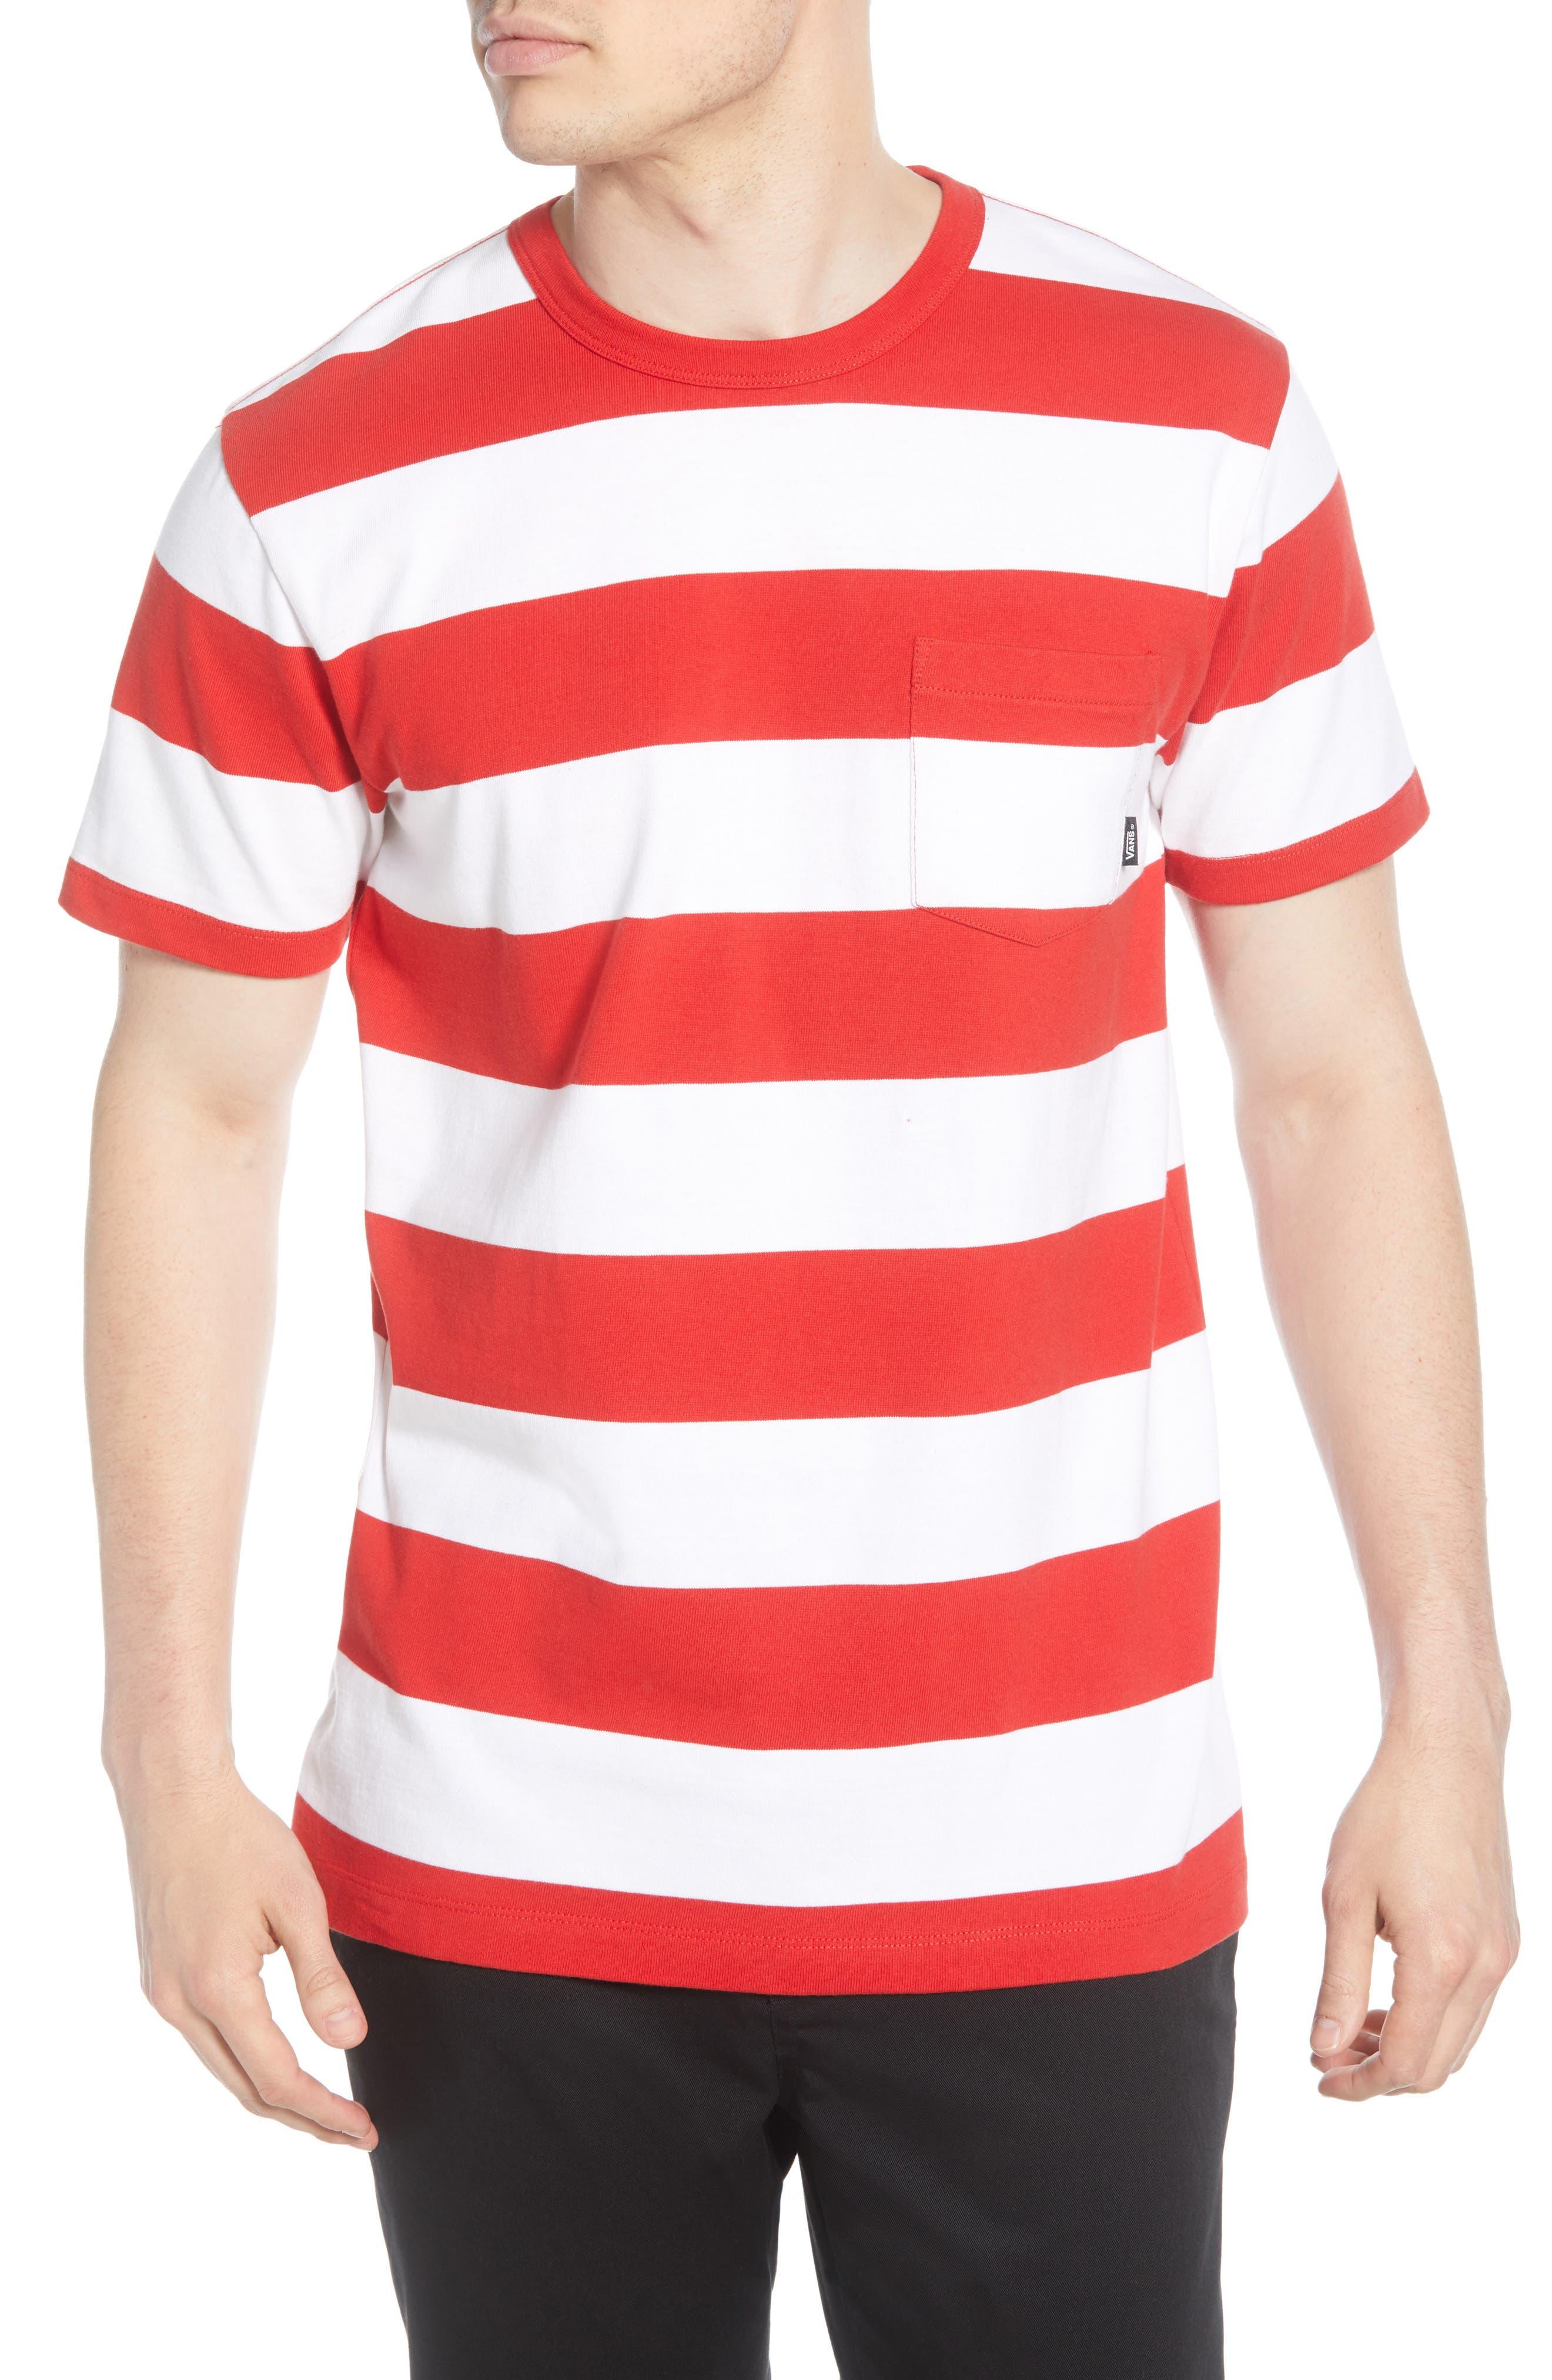 1940s Style Mens Shirts, Sweaters, Vests Mens Vans Anaheim Issue Stripe Pocket T-Shirt $44.50 AT vintagedancer.com